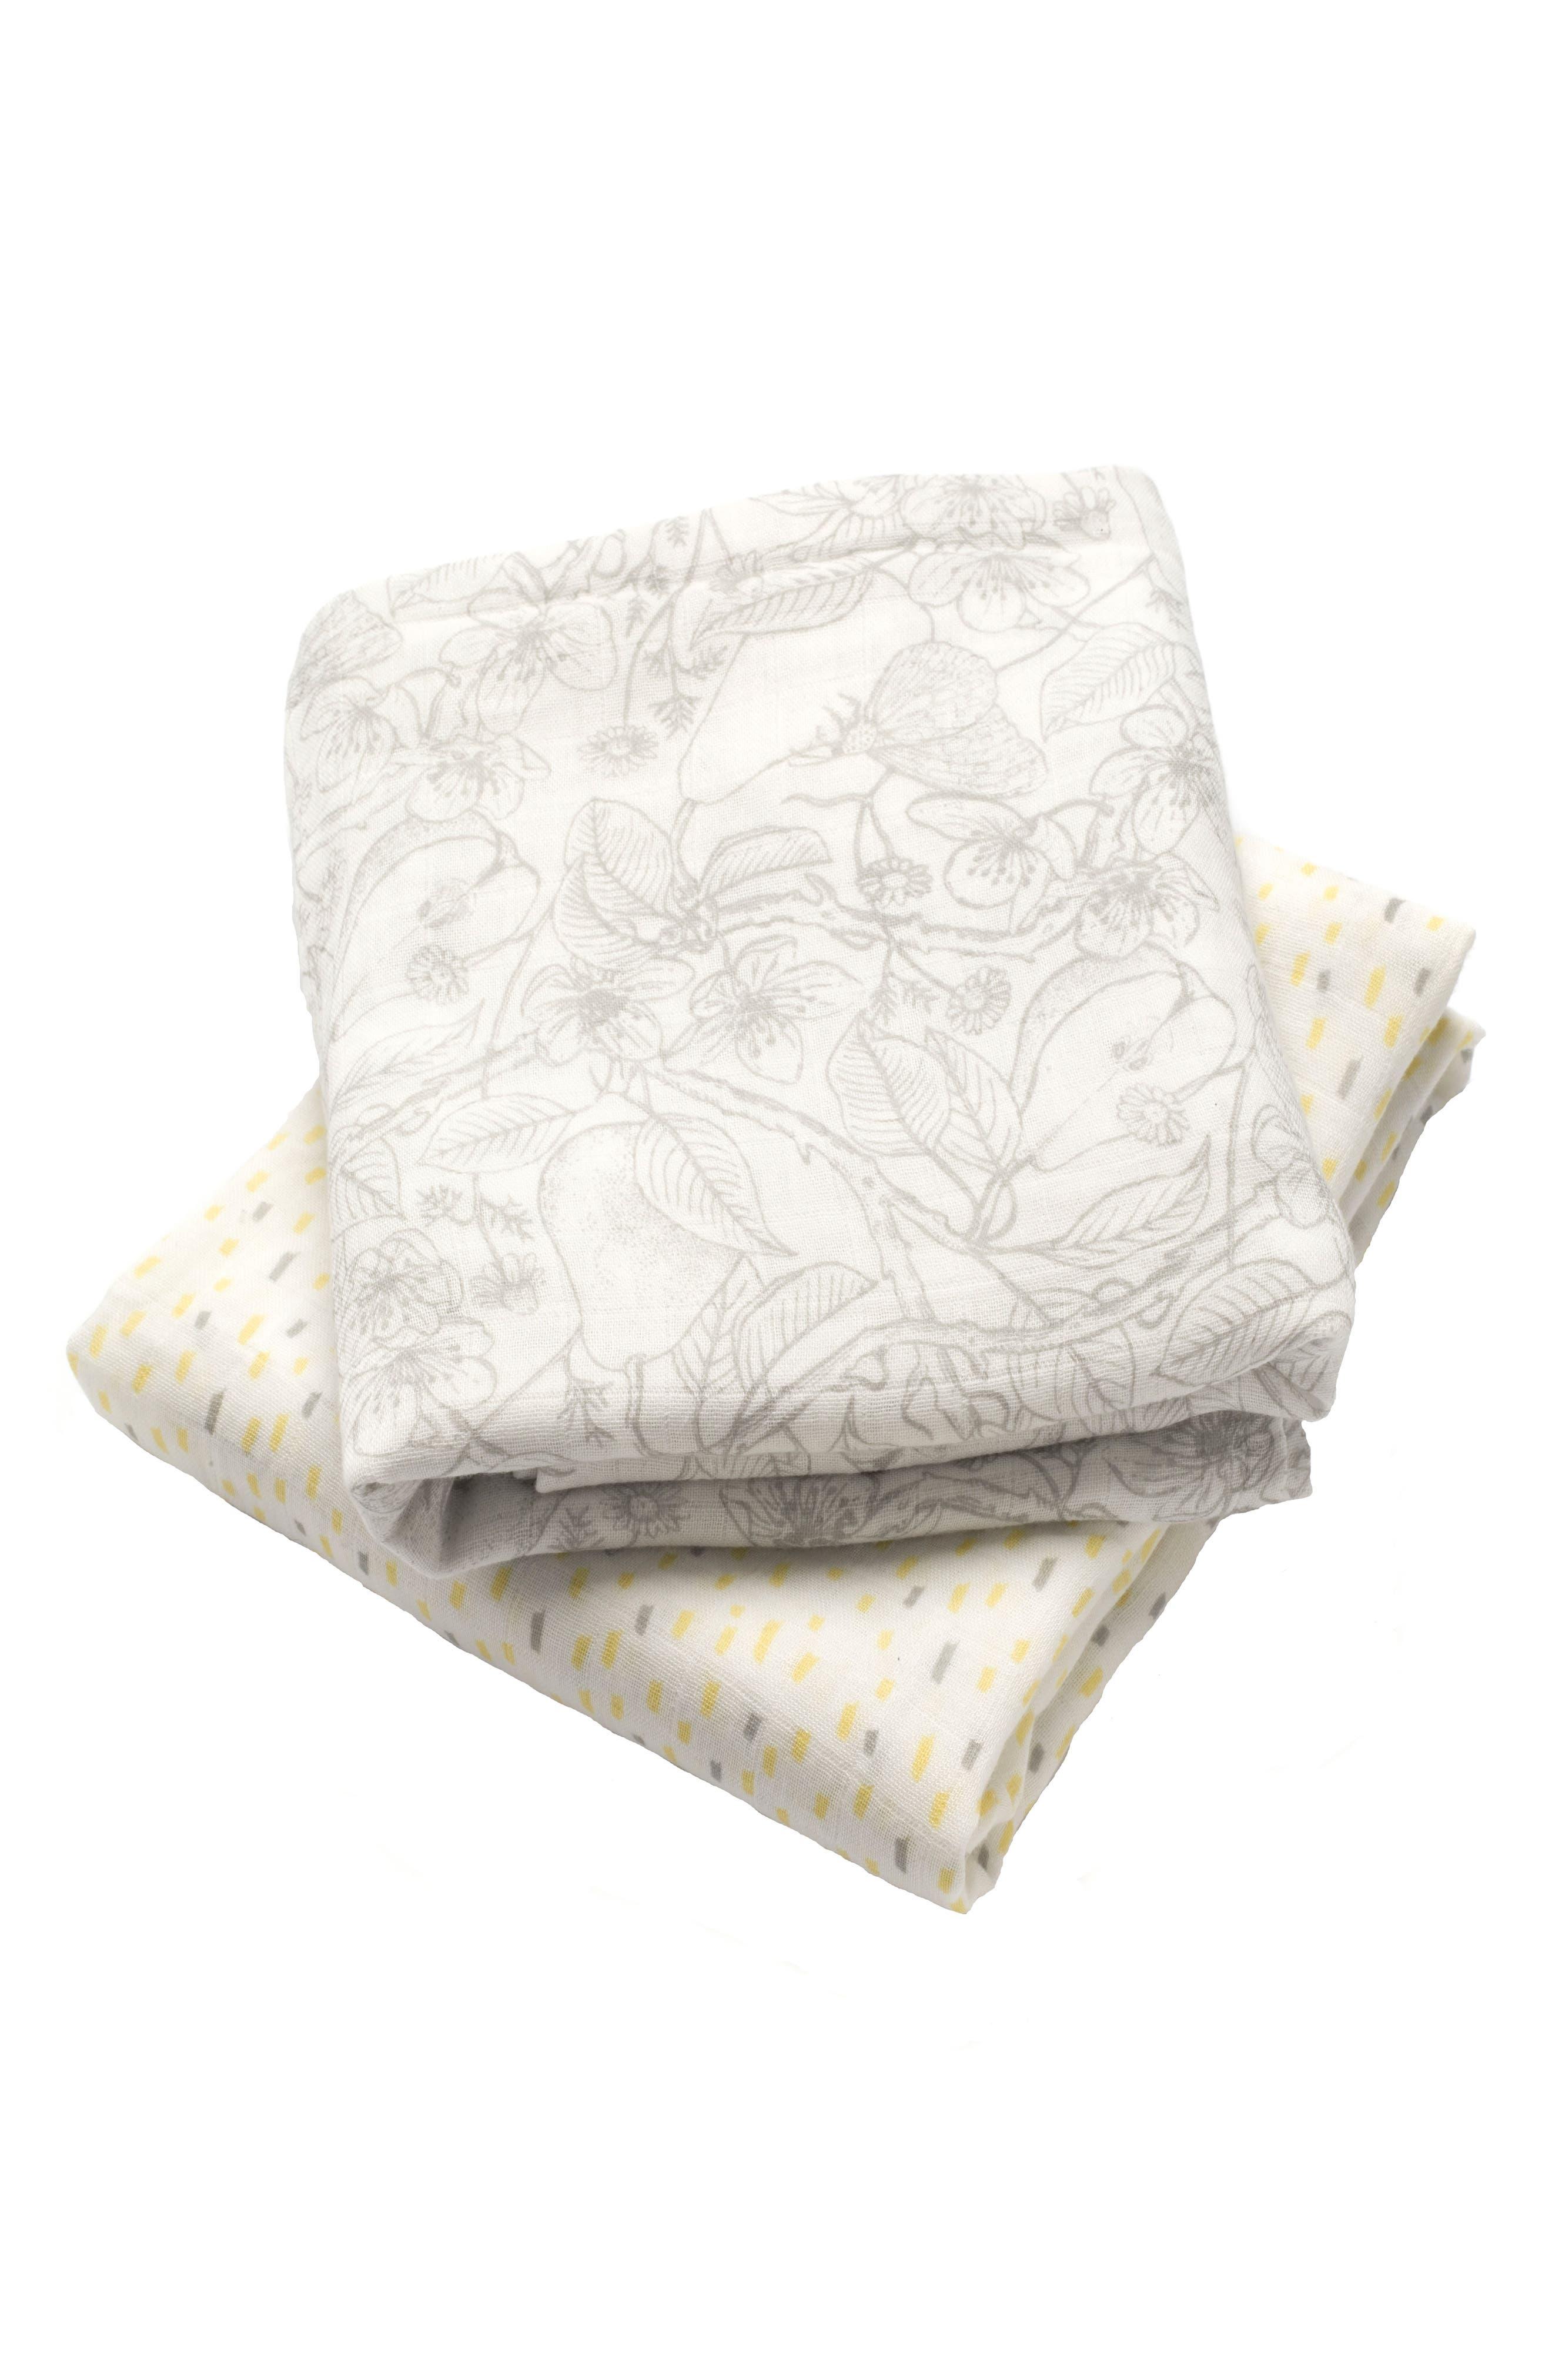 Main Image - Storksak Set of 2 Muslin Swaddling Cloths